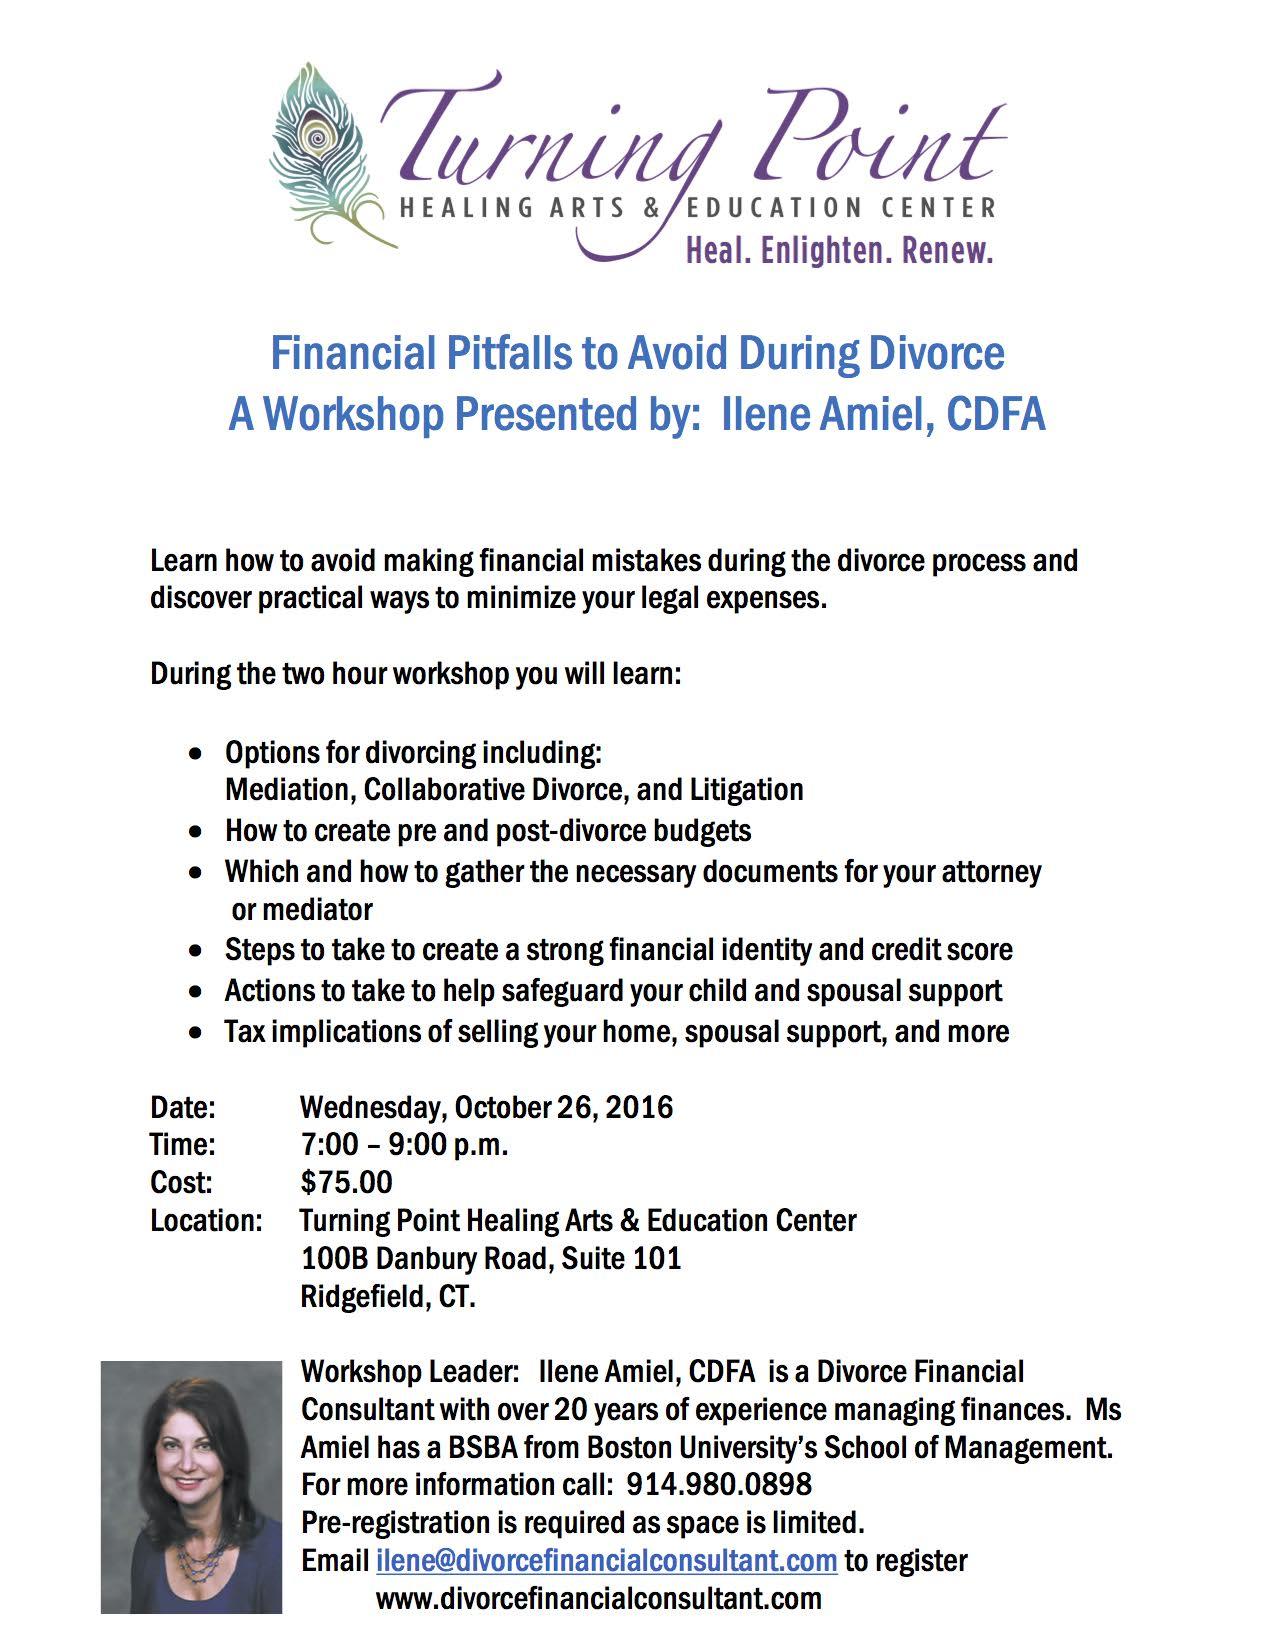 Divorce Workshop:  Financial Pitfalls to Avoid During Divorce